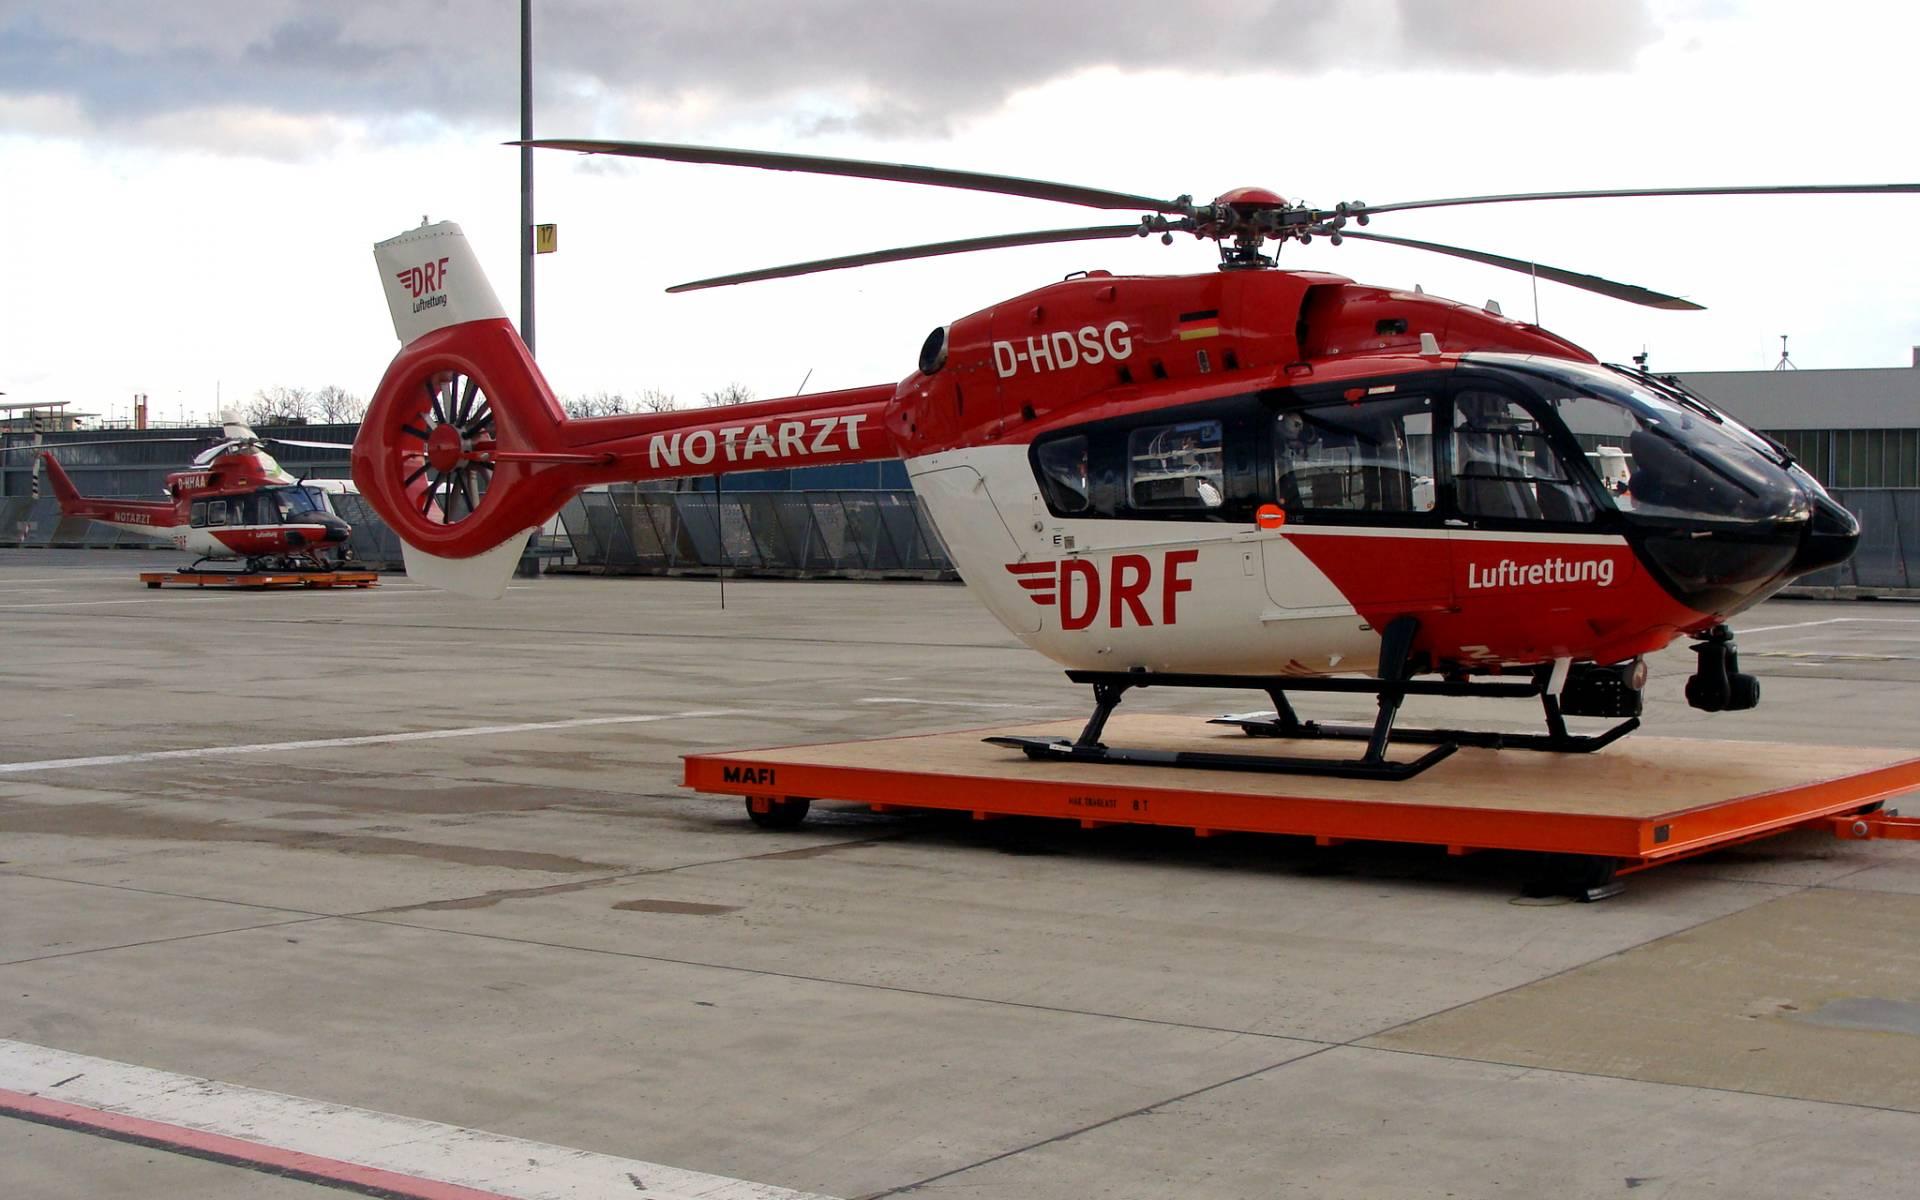 Nürnberg Hubschrauber